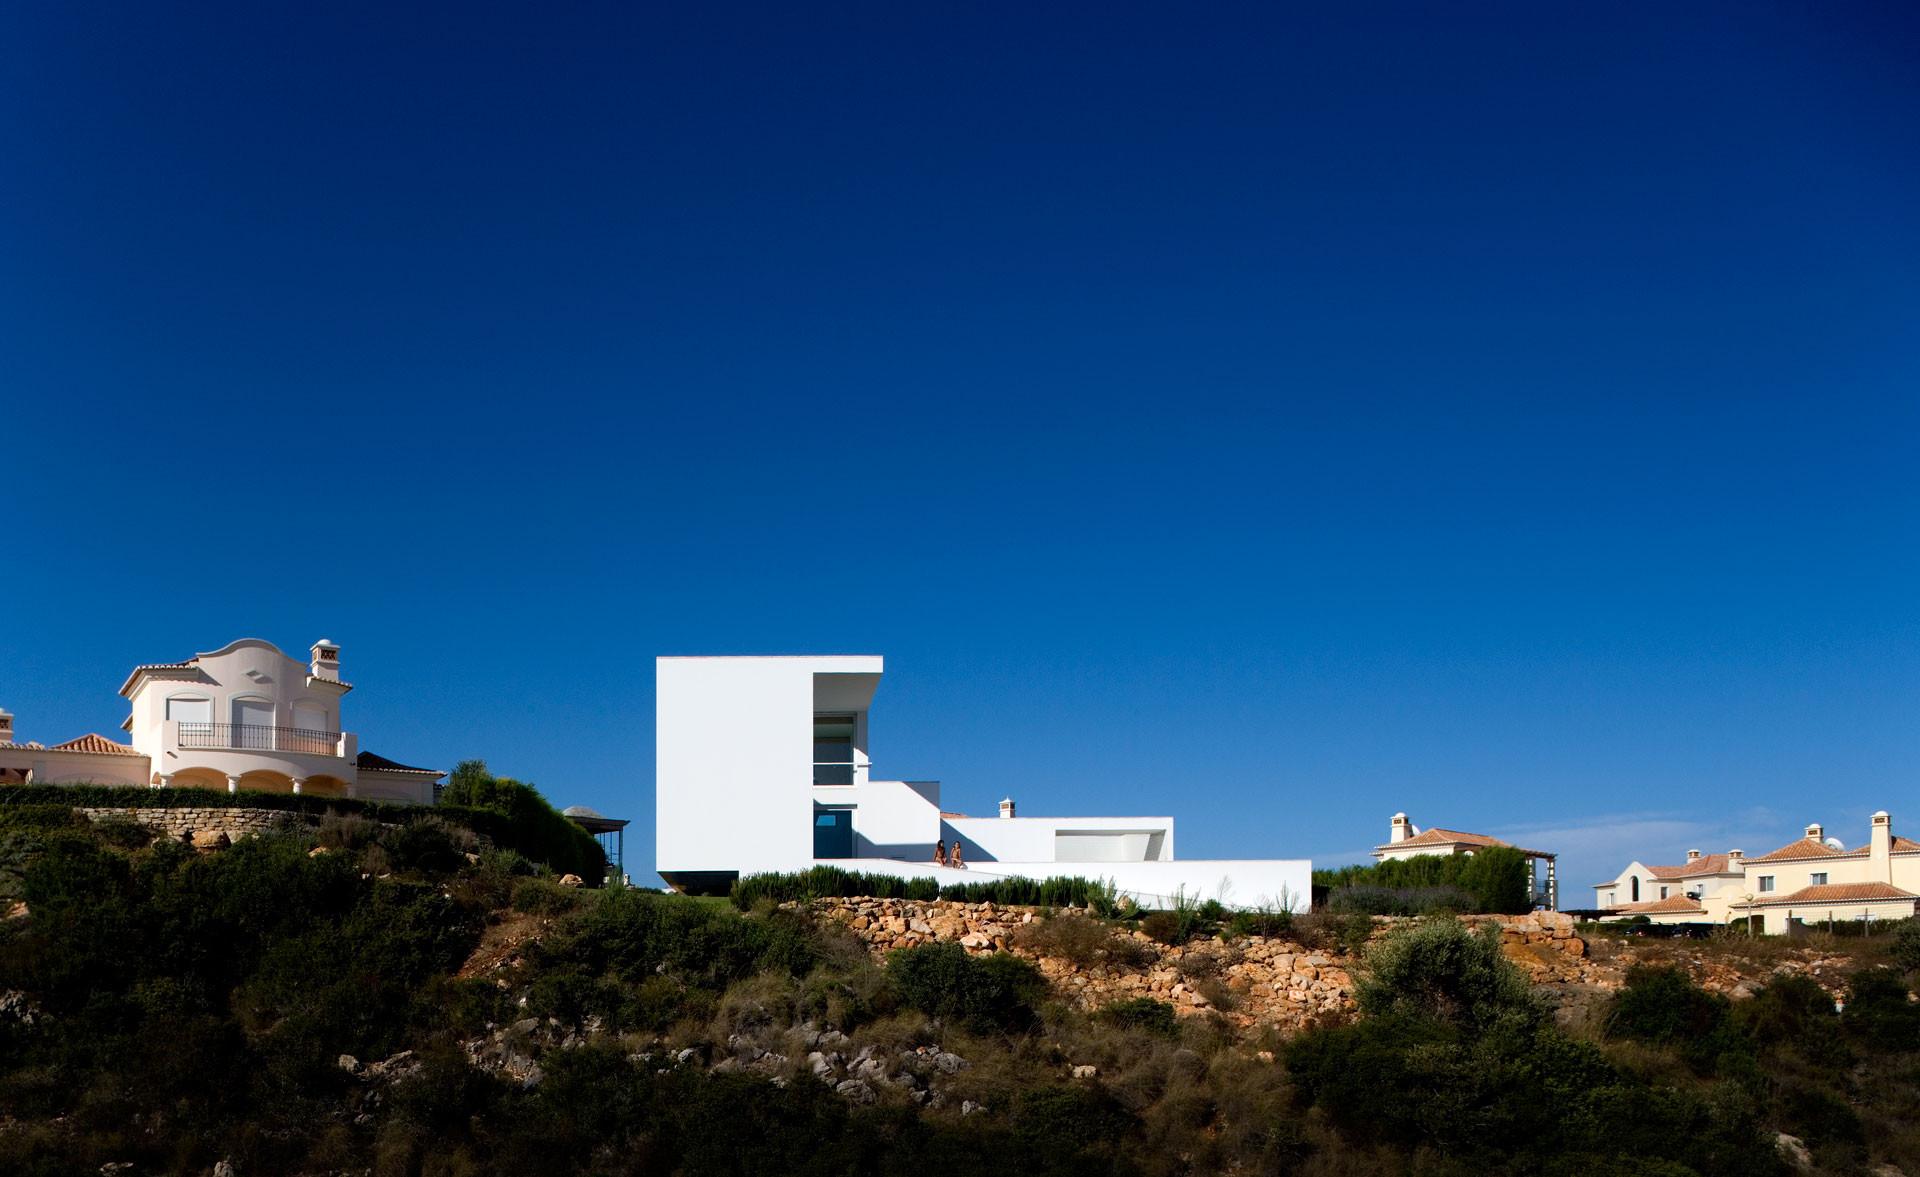 Casa en Martinhal / ARX Portugal, © FG+SG – Fernando Guerra, Sergio Guerra